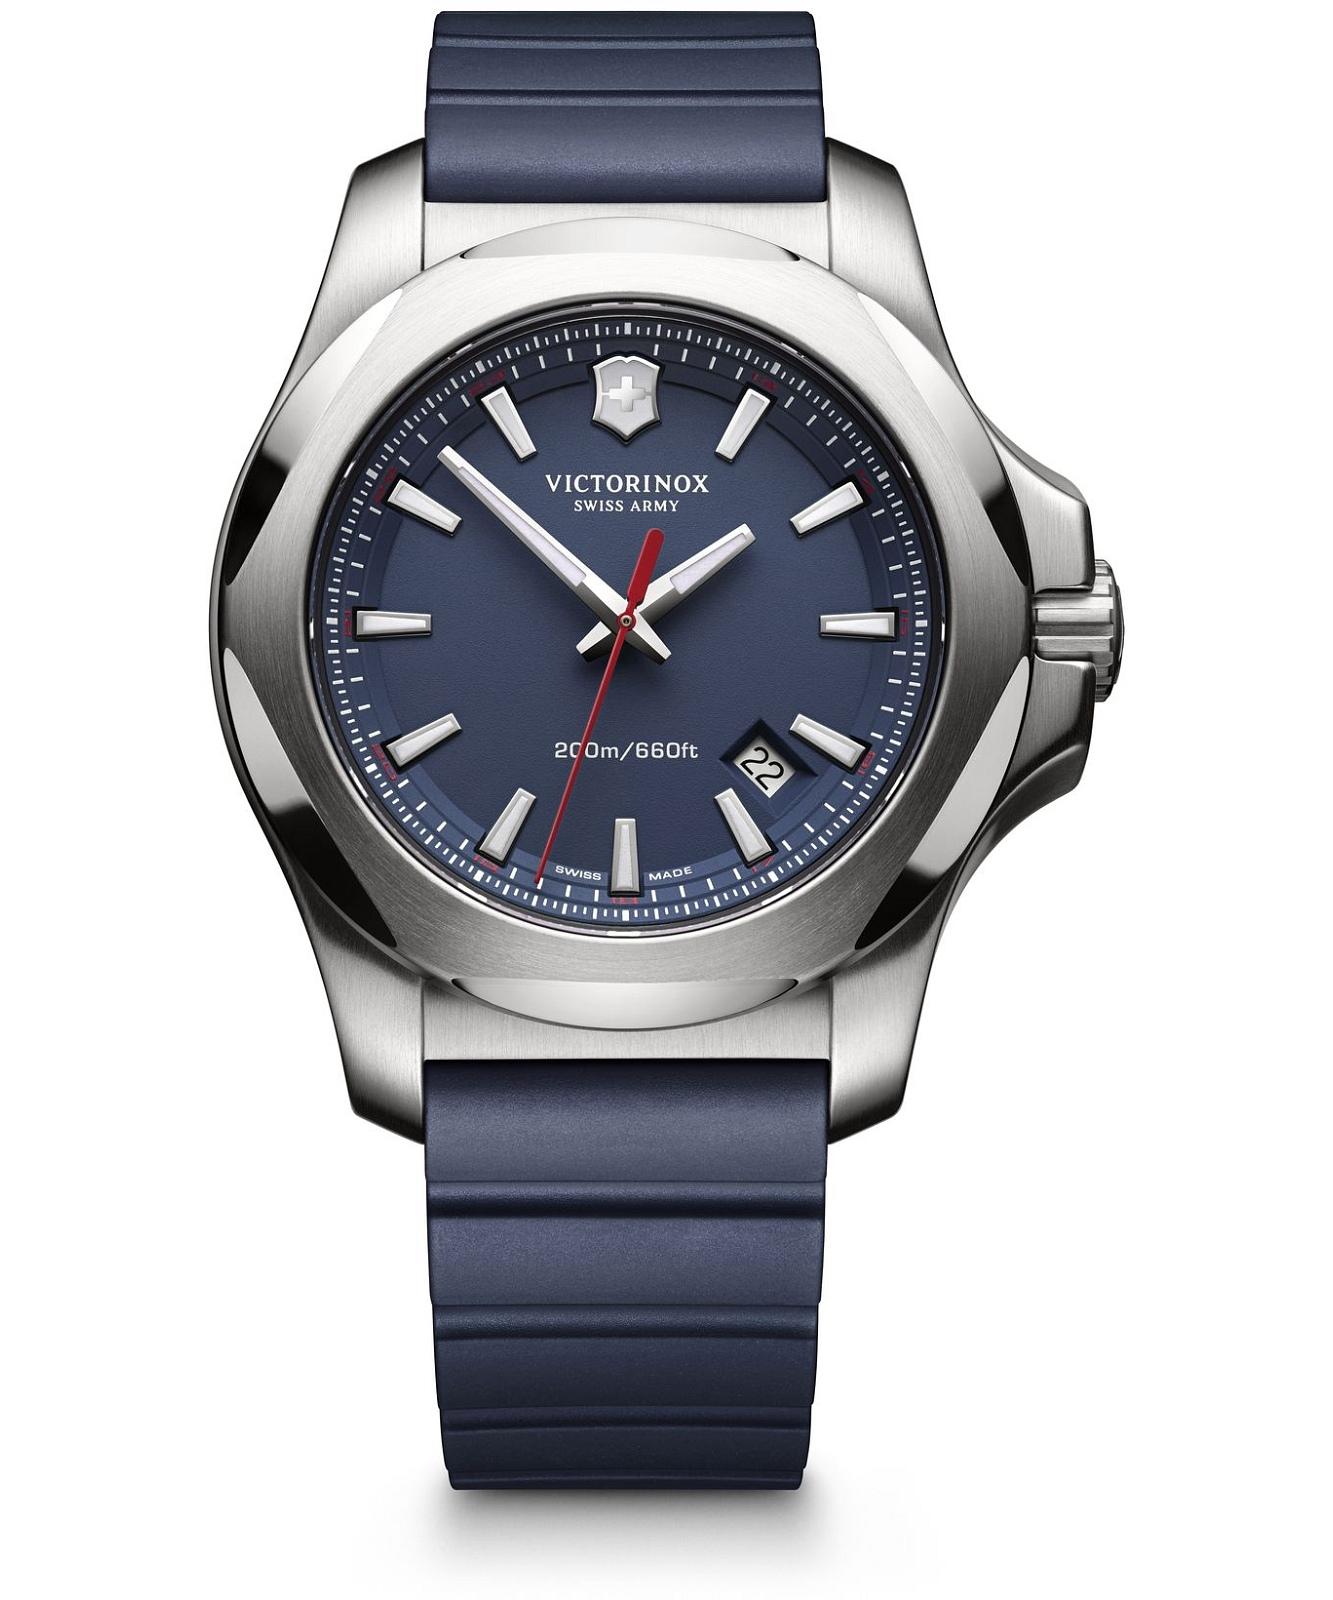 zegarek-meski-victorinox-i-n-o-x-rubber-241688-1_001